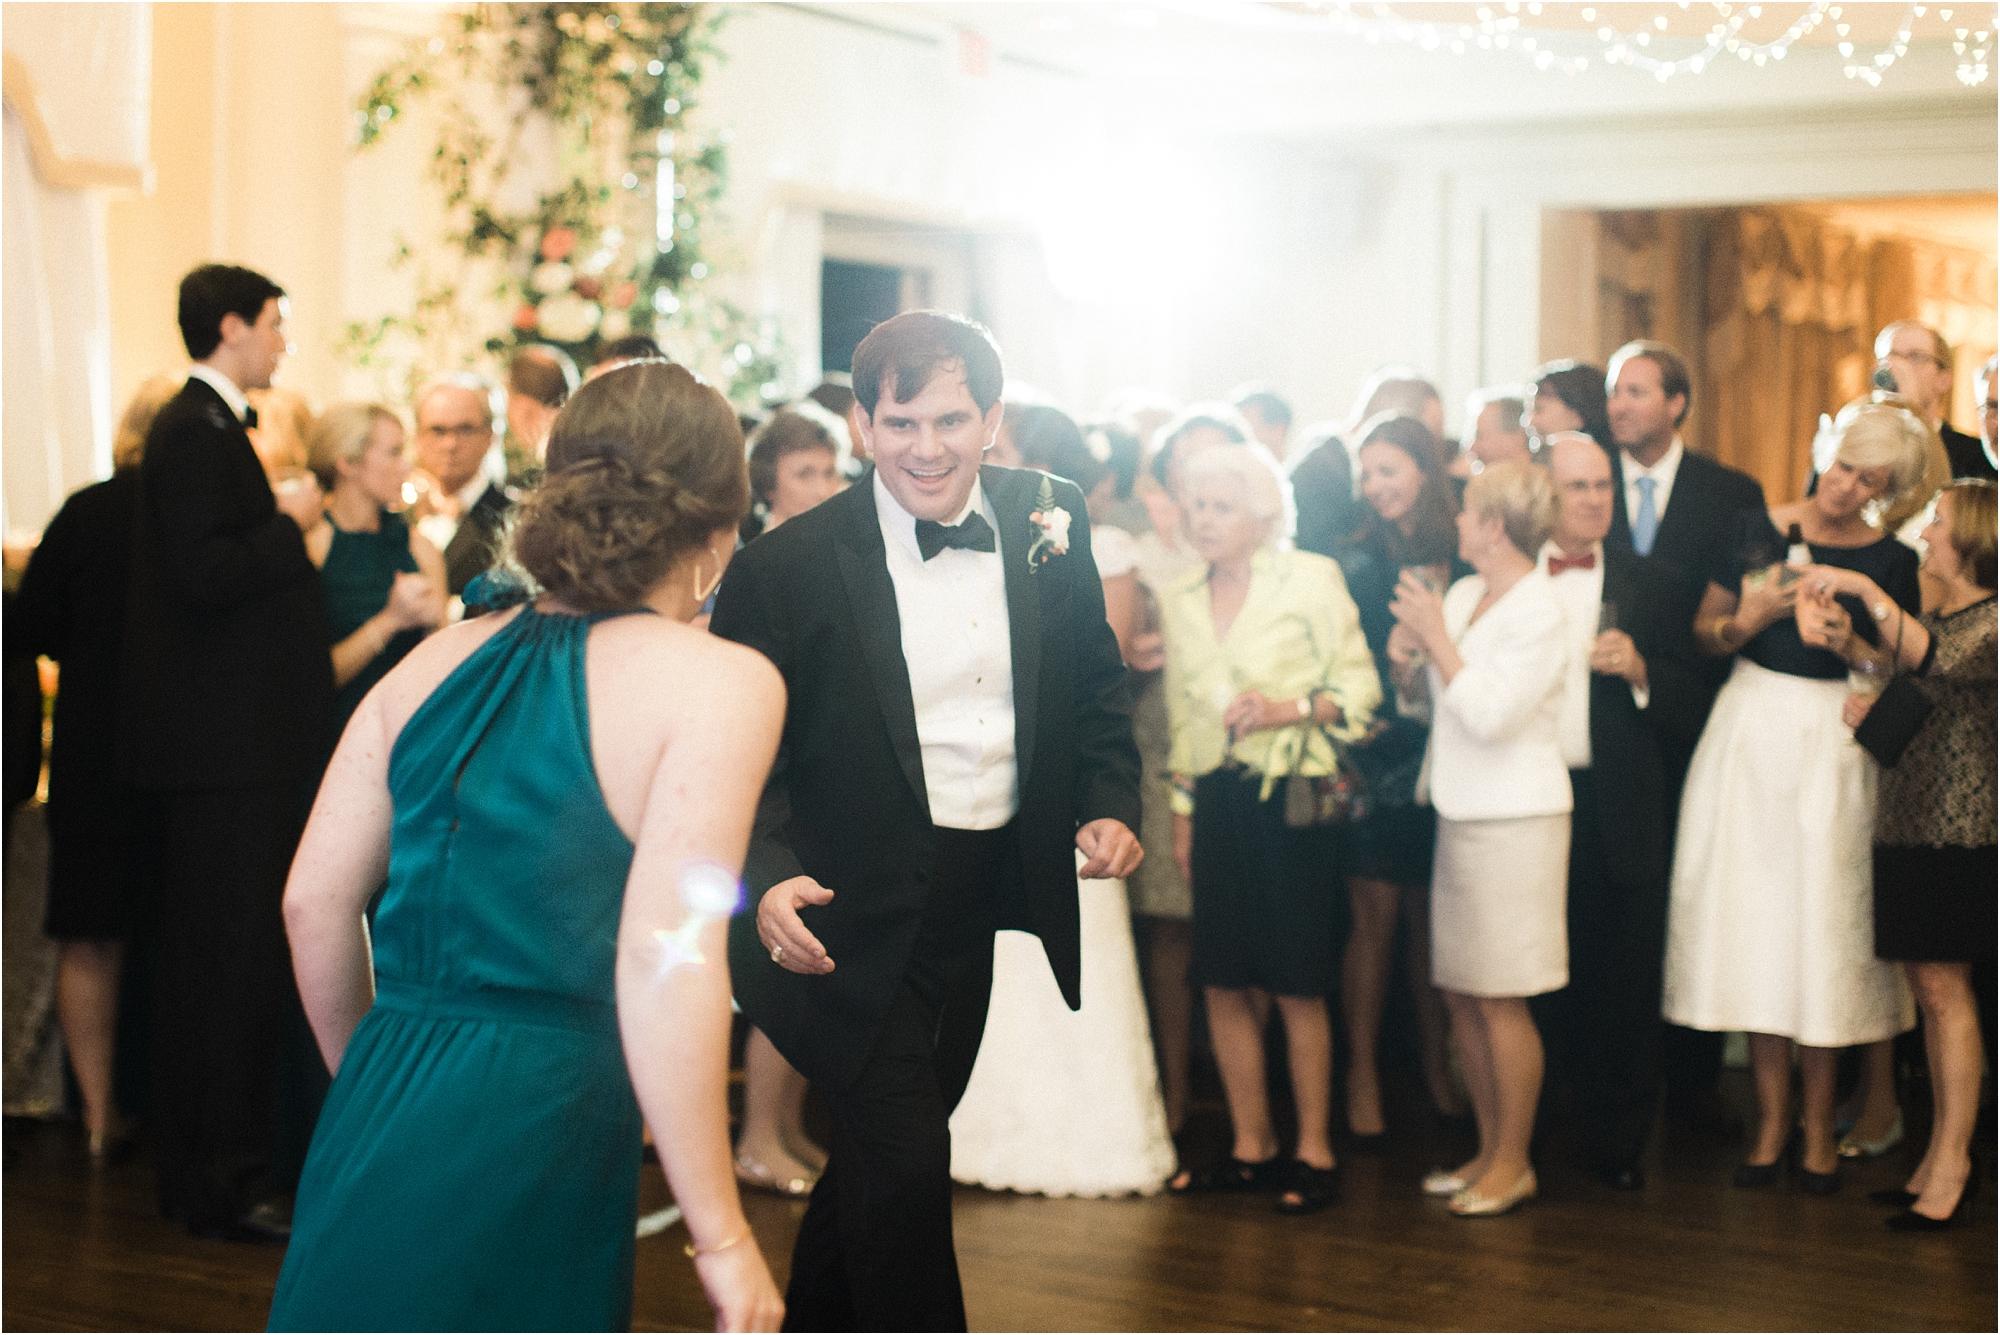 stephanie-yonce-photography-richmond-virginia-country-club-wedding-photo_043.JPG